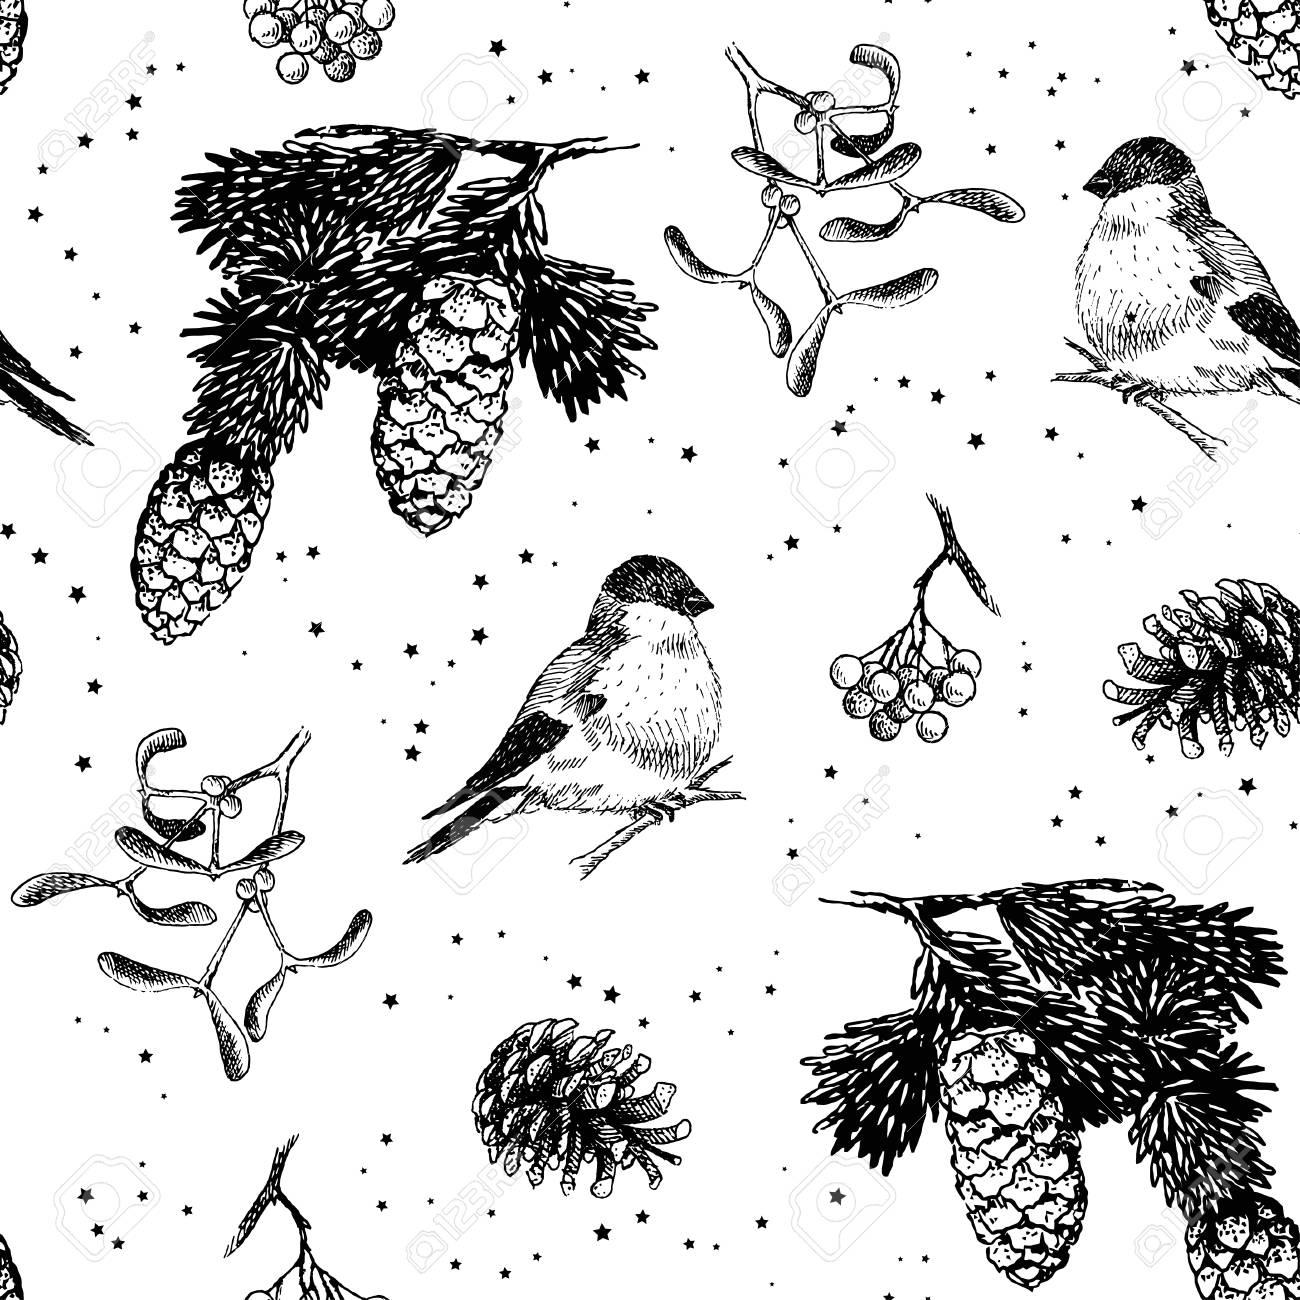 1300x1300 Christmas Pattern Seamless, Hand Drawing Sketch Illustration